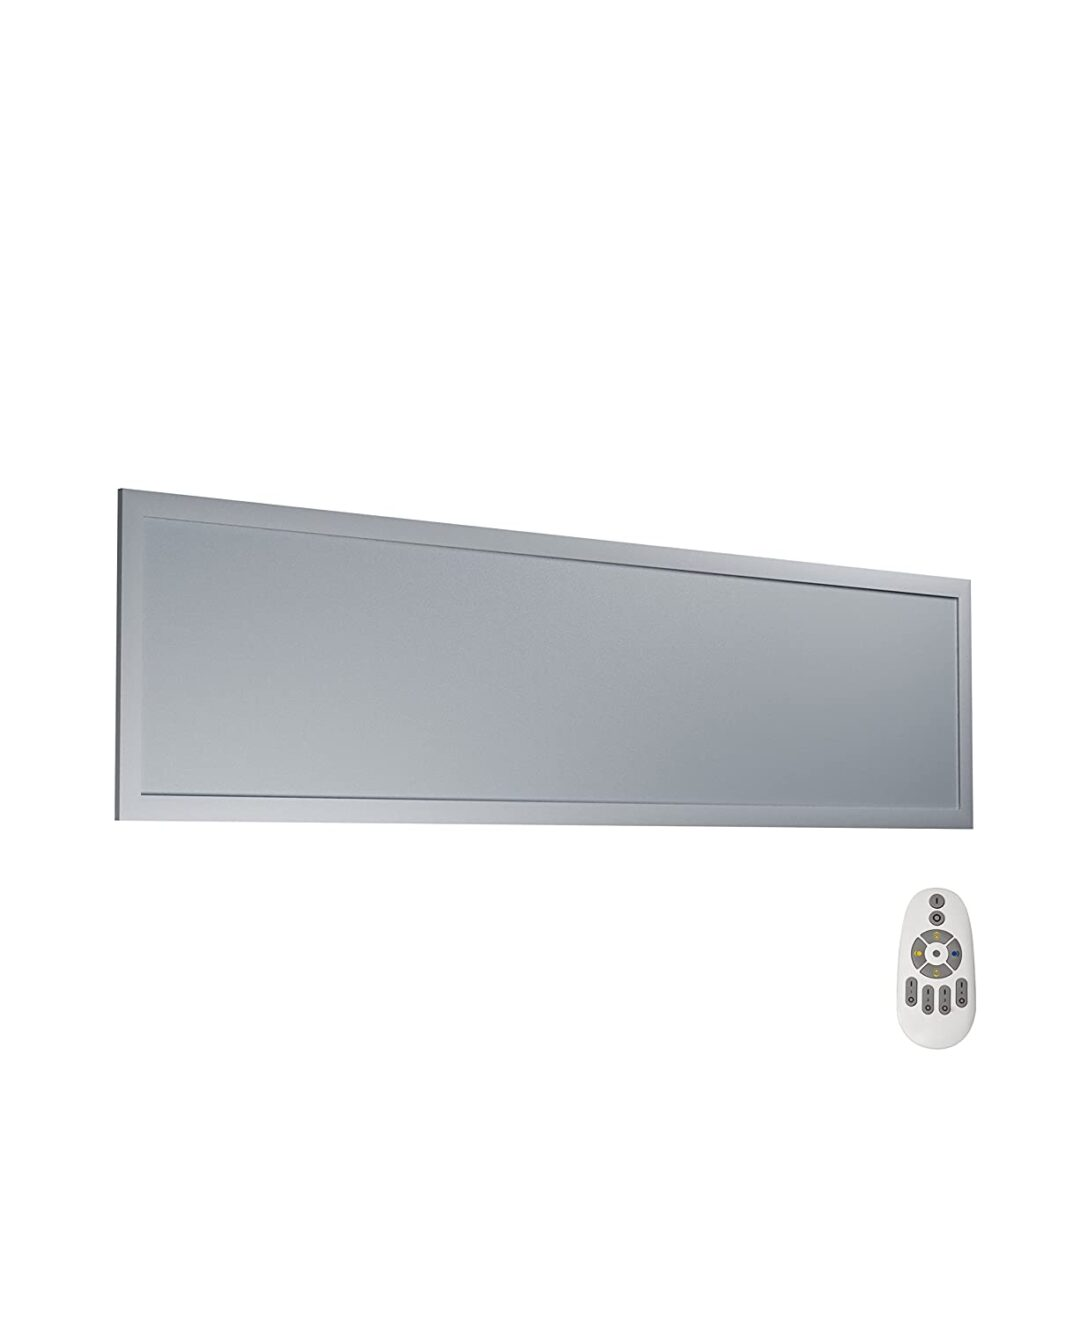 Large Size of Osram Ledvance 40w 600x600 Led Panel   4000k Light 60x60 Planon Plus 300x600mm Pure 1200x300mm Pdf Table Lamp 32w 1200x300 Frameless 60w 3000k 600 X 60x30cm Wohnzimmer Osram Led Panel